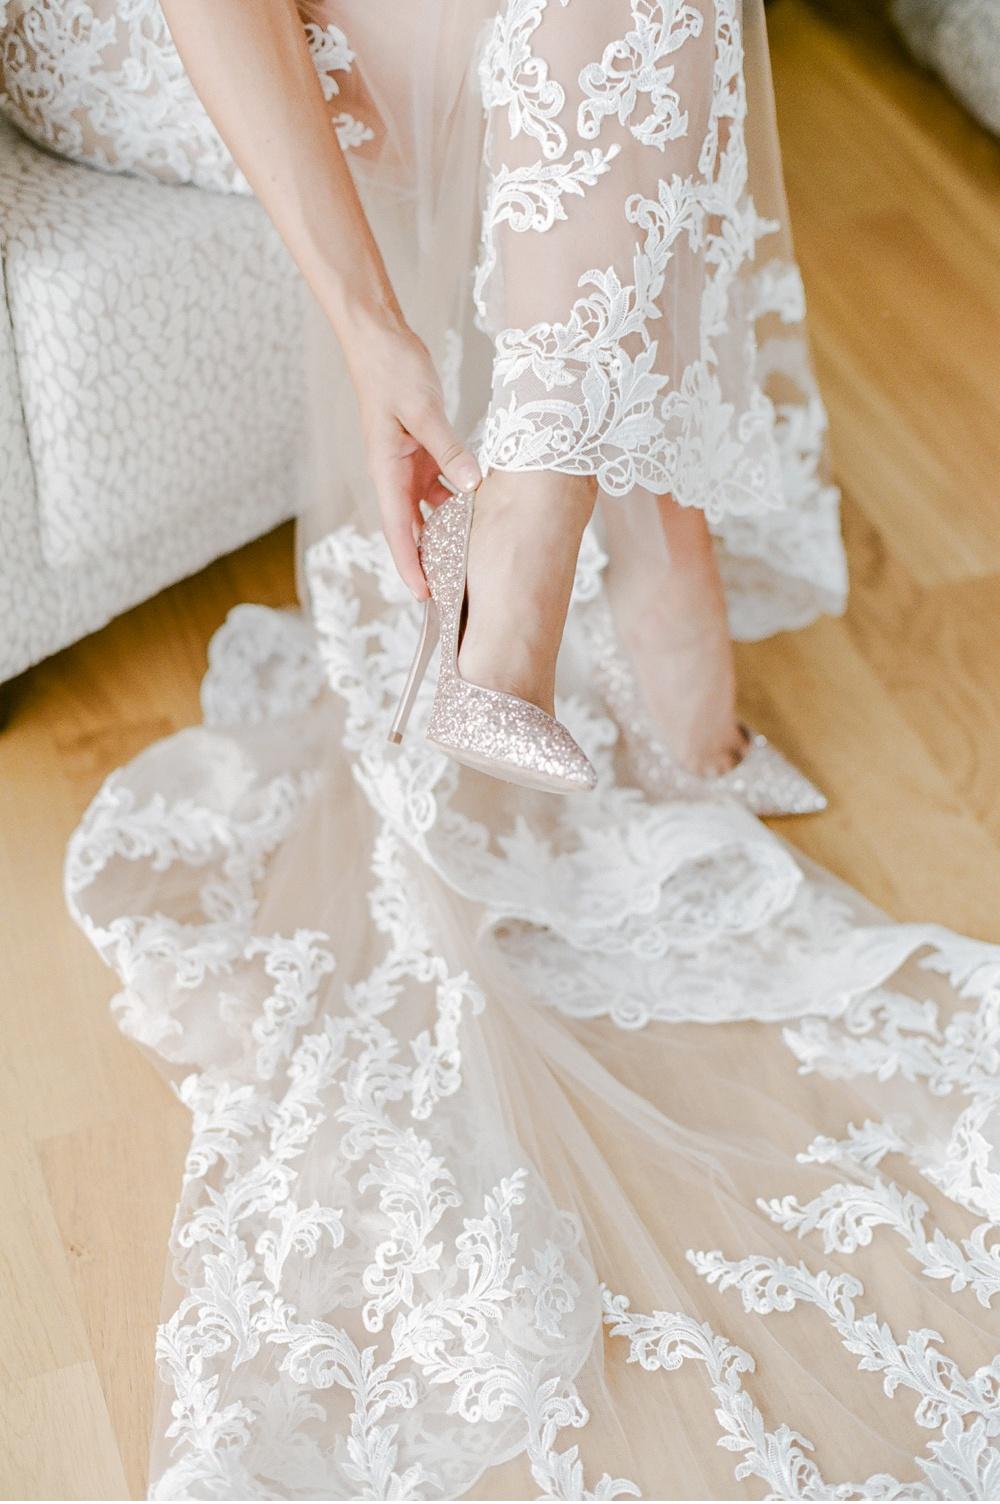 FineArt_Wedding_Photographer@MadalinaSheldon__0007.jpg